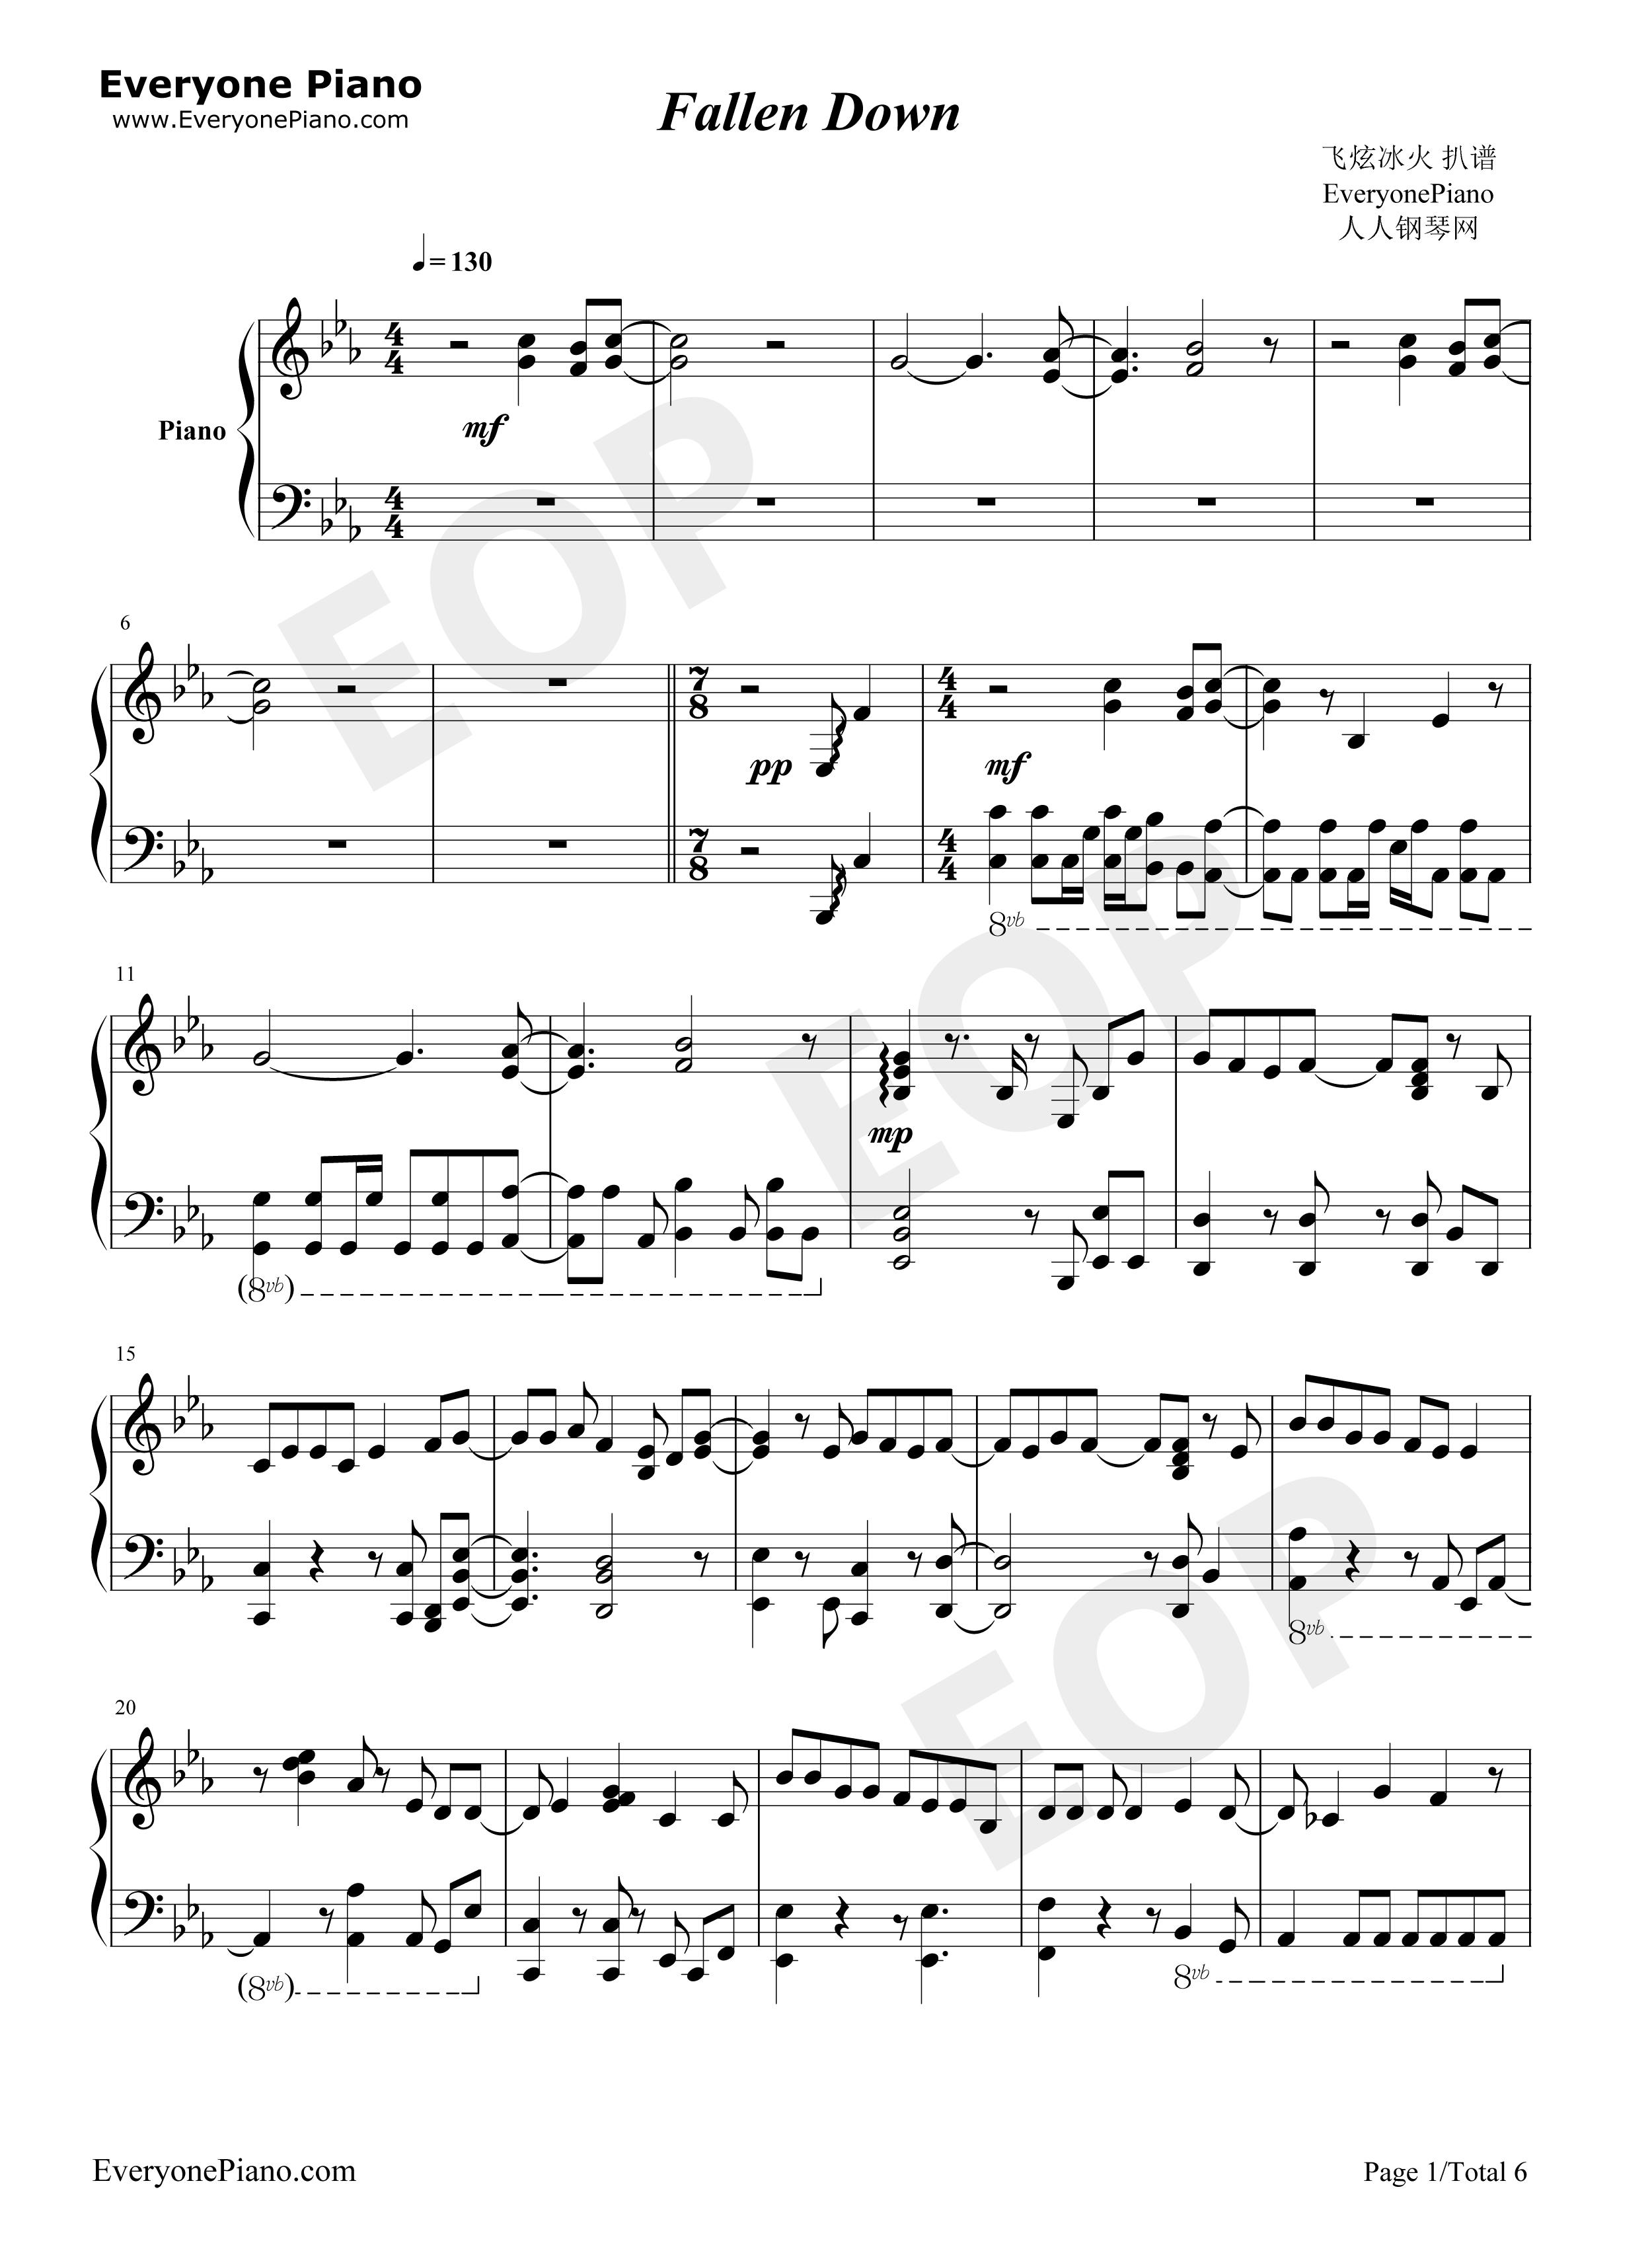 Fallen down sora no otoshimono free piano sheet music piano chords fallen down sora no otoshimono stave preview 1 hexwebz Image collections